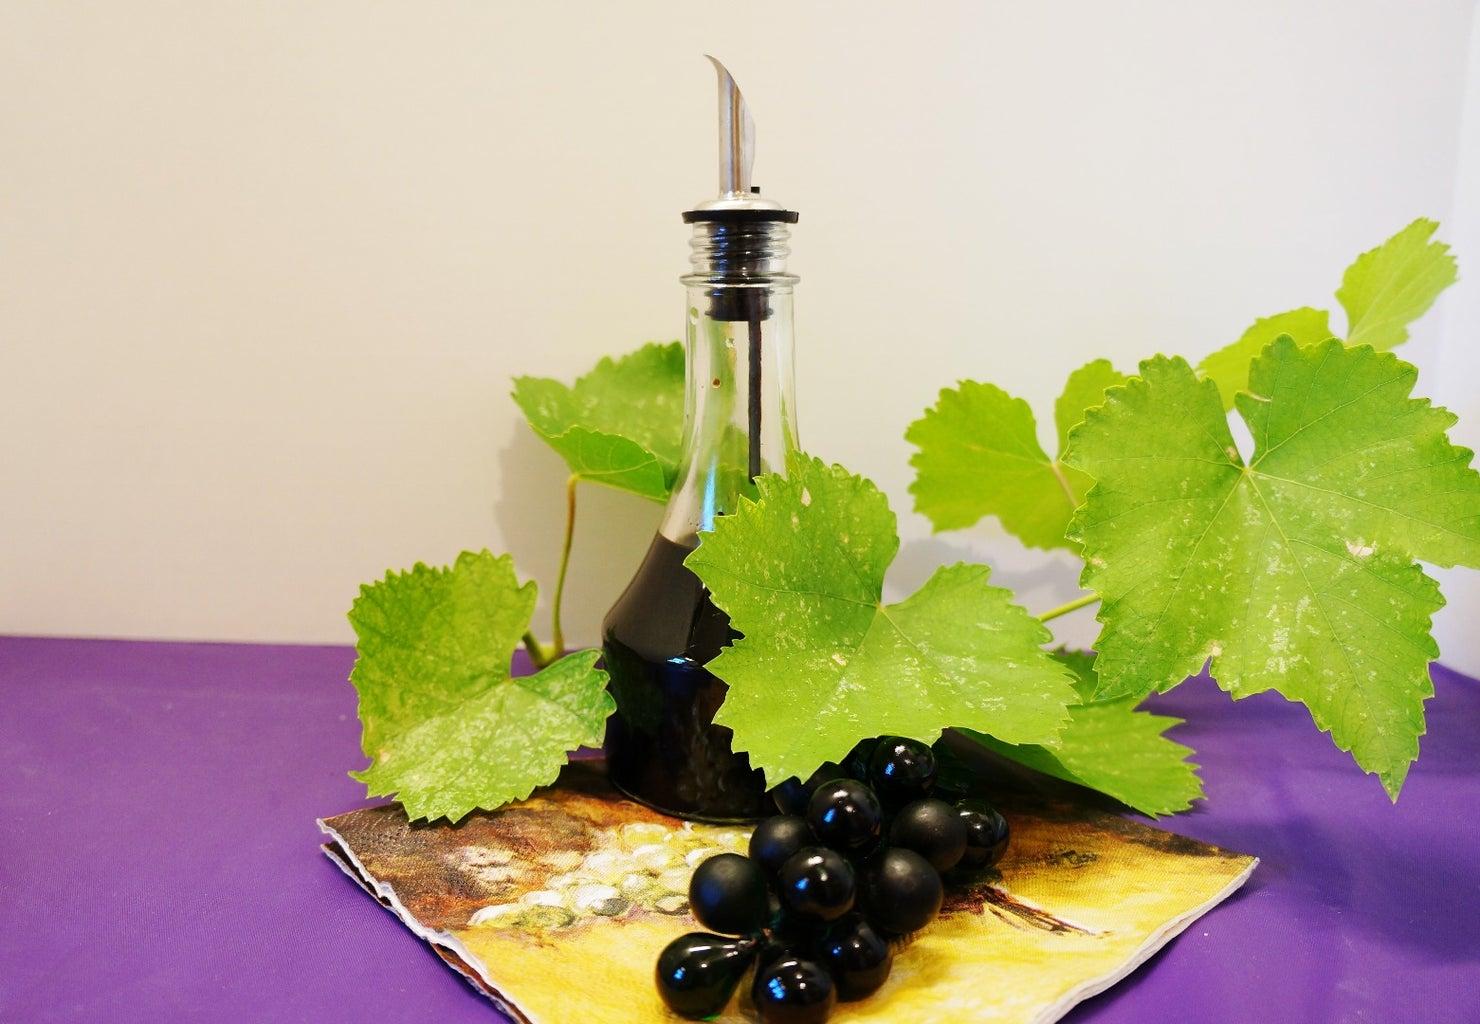 Kick Up Cheap Balsamic Vinegar a Few Notches Using This Technique